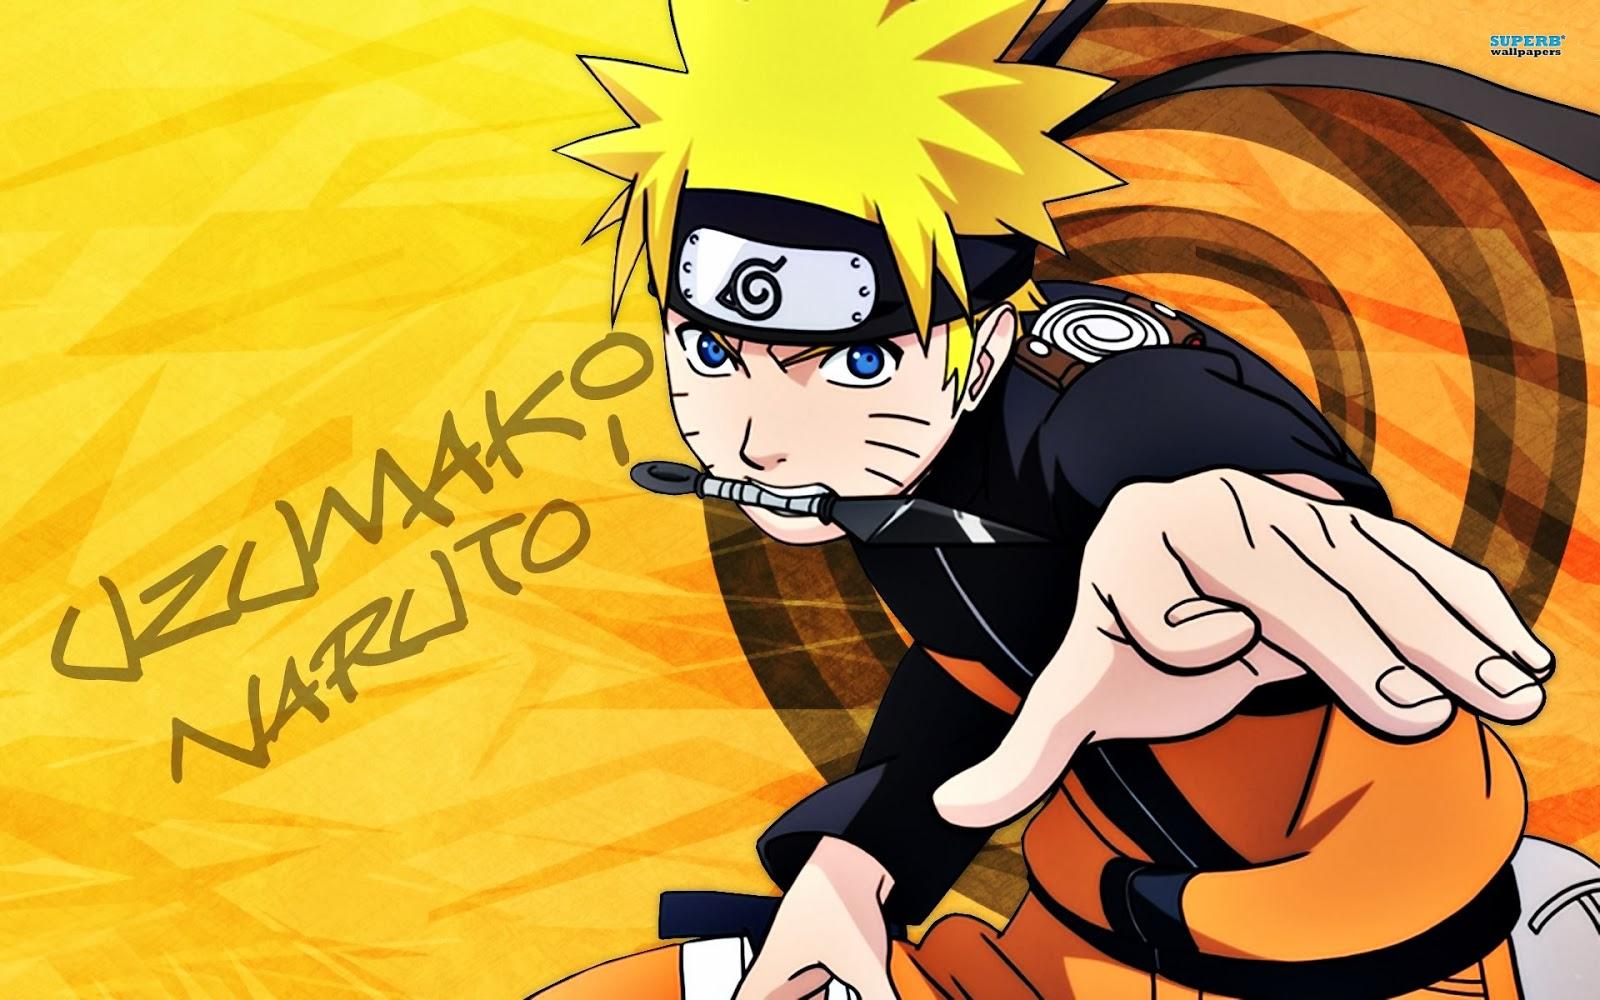 Kumpulan Gambar Naruto Terbaru 2014 Ruang Artis